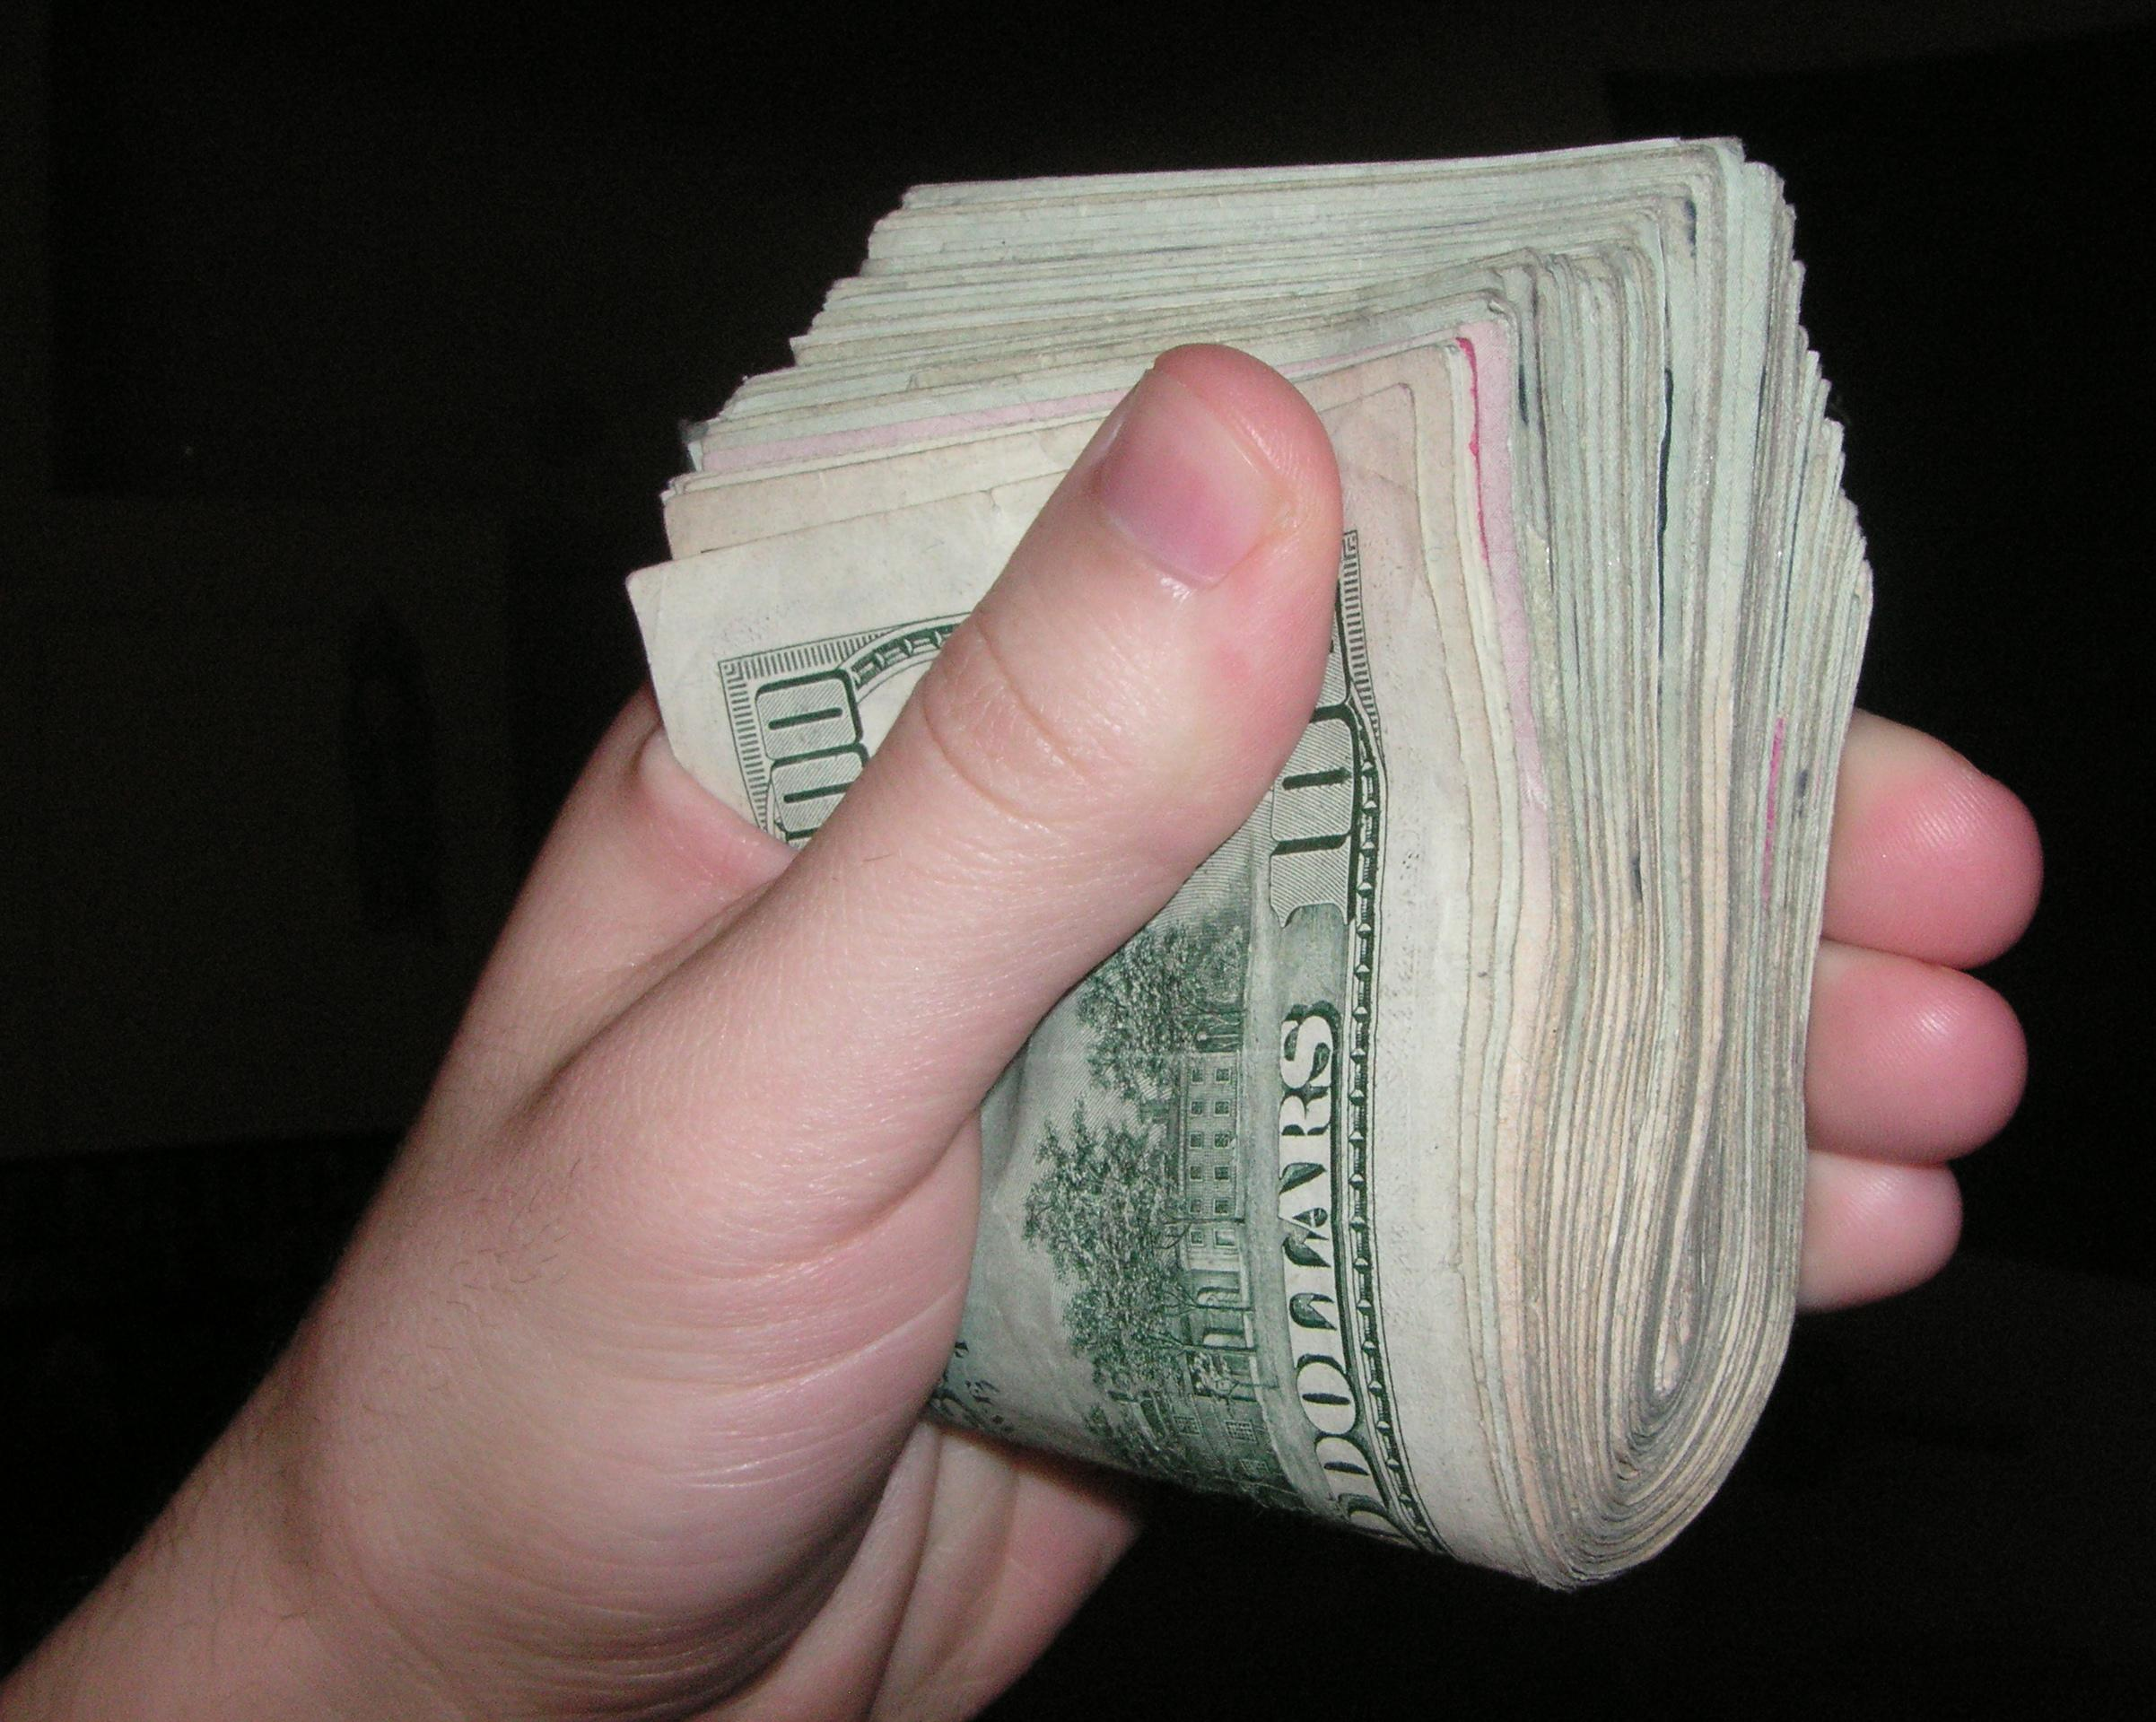 https://upload.wikimedia.org/wikipedia/commons/d/d9/American_Cash.JPG